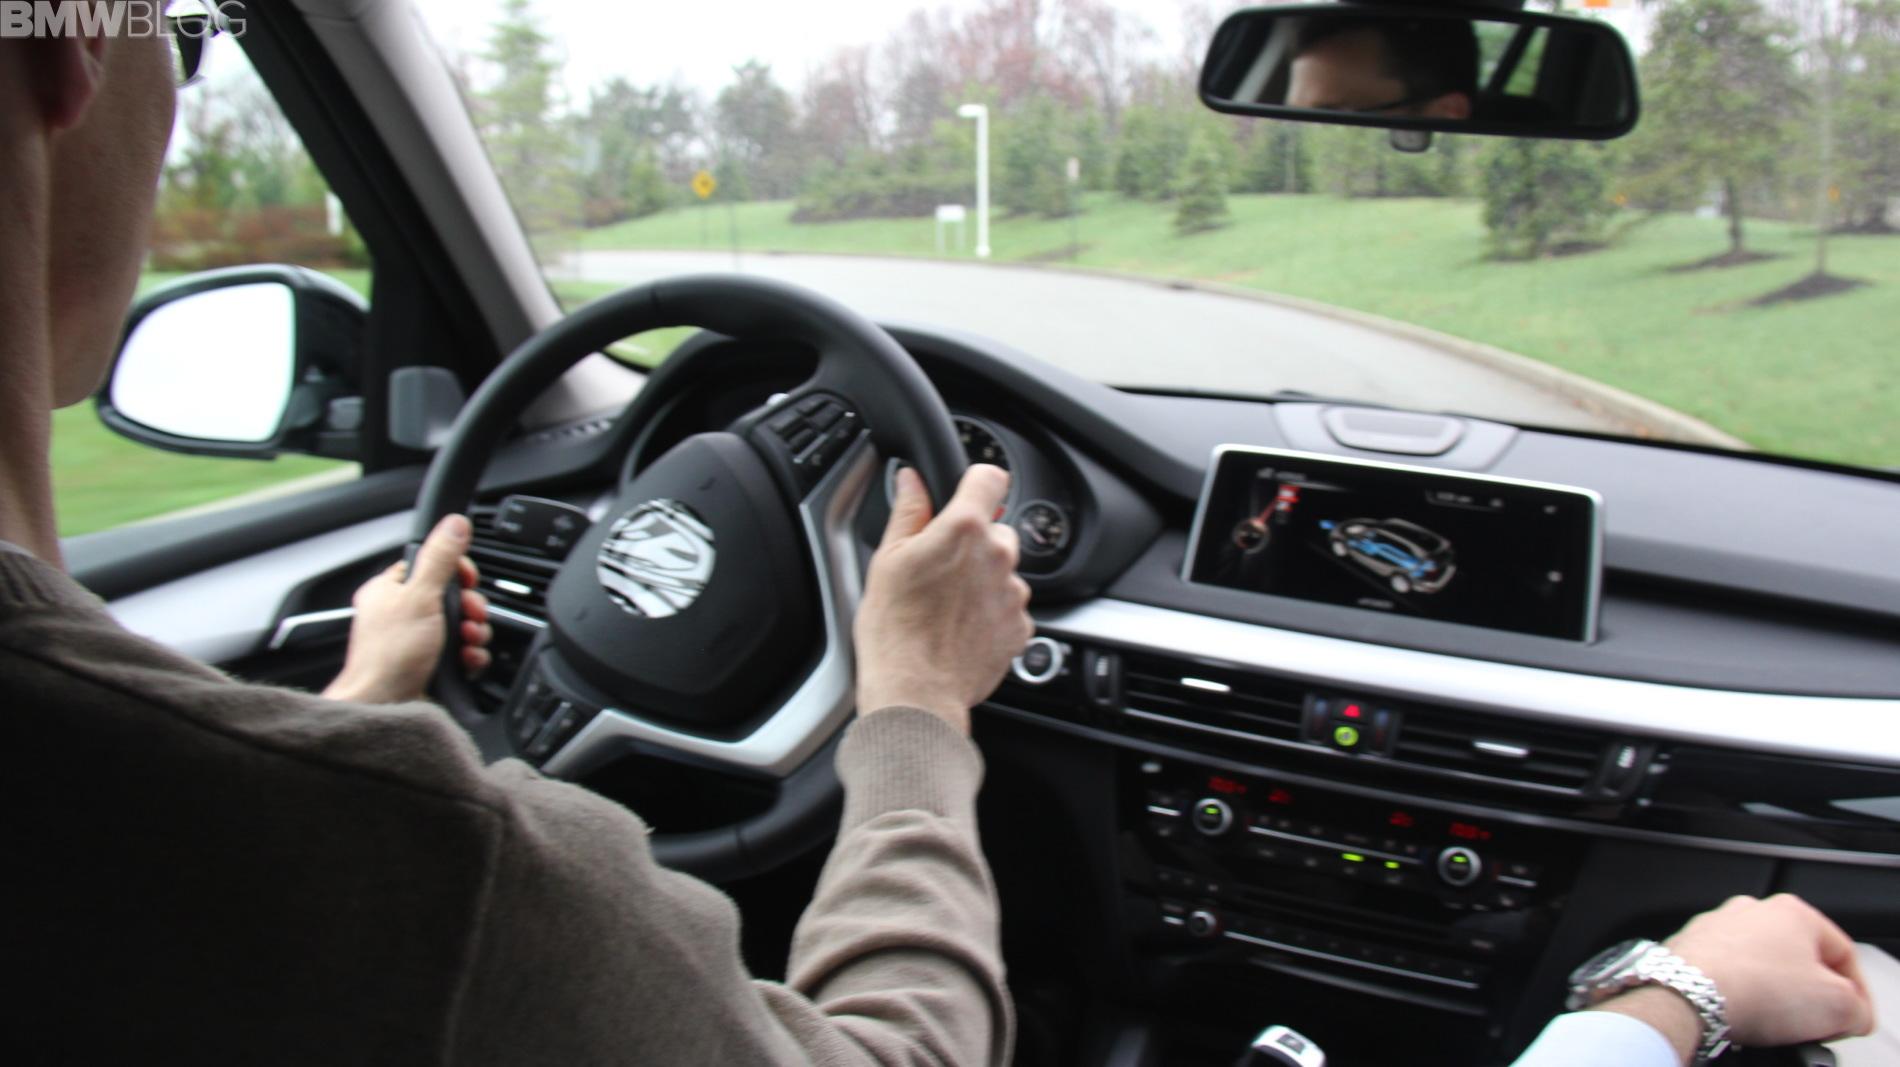 test drive bmw x5 edrive hybrid